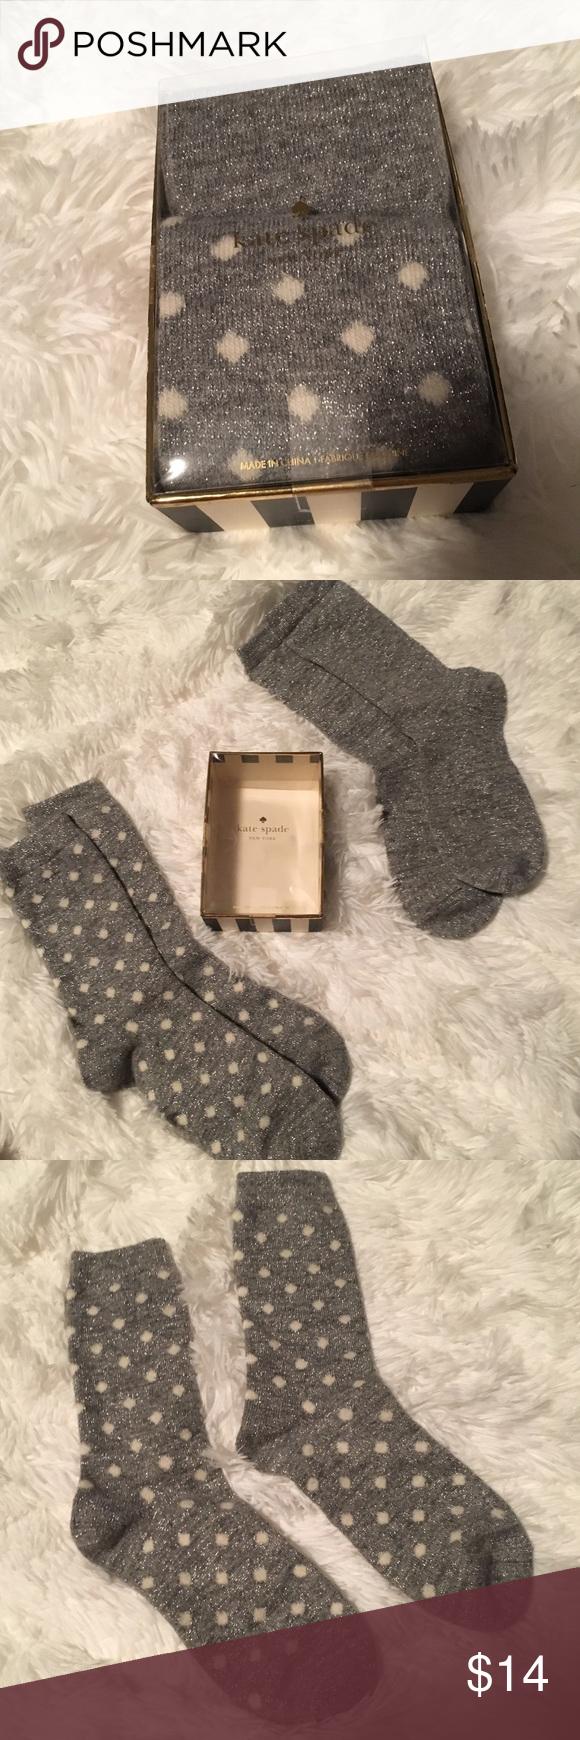 BNIB Kate Spade Socks Gift Set Kate Spade gift set that includes 2 pairs of socks. 1 Pair of gray sparkly socks and 1 pair of sparkly polkadot socks. 100% Authentic. Brand new in box. kate spade Accessories Hosiery & Socks